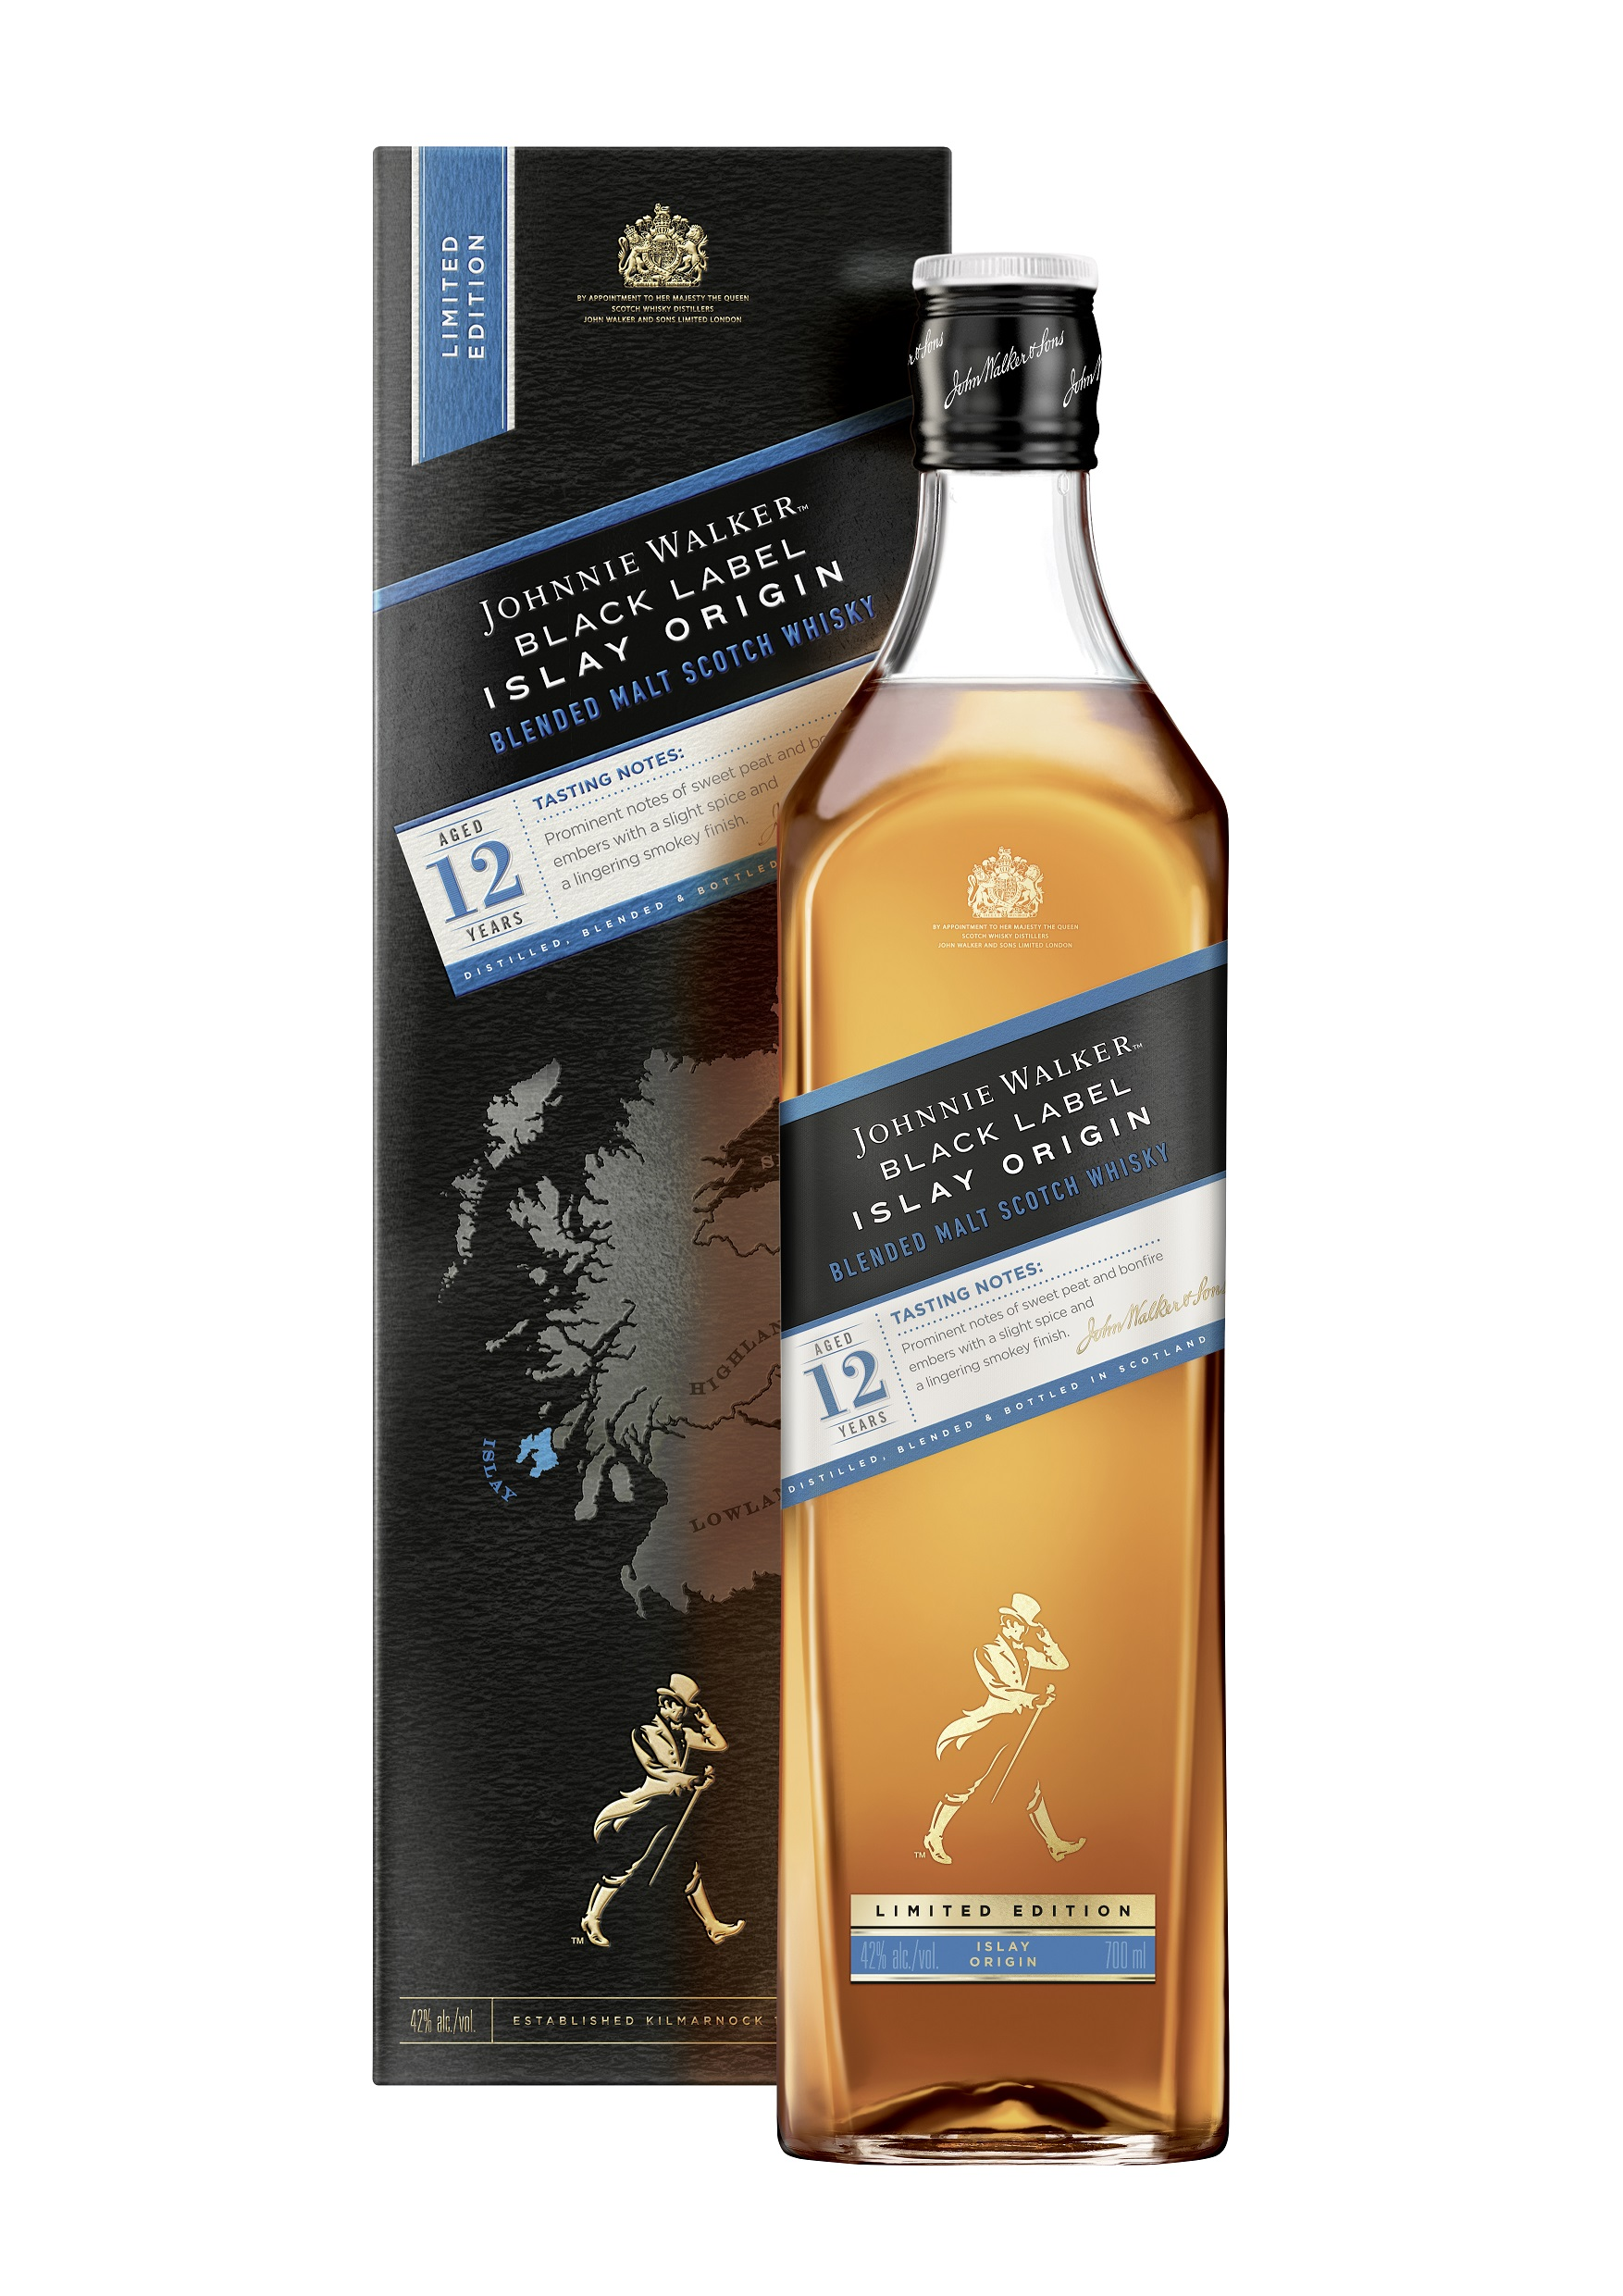 Johnnie Walker Islay Origin Whisky